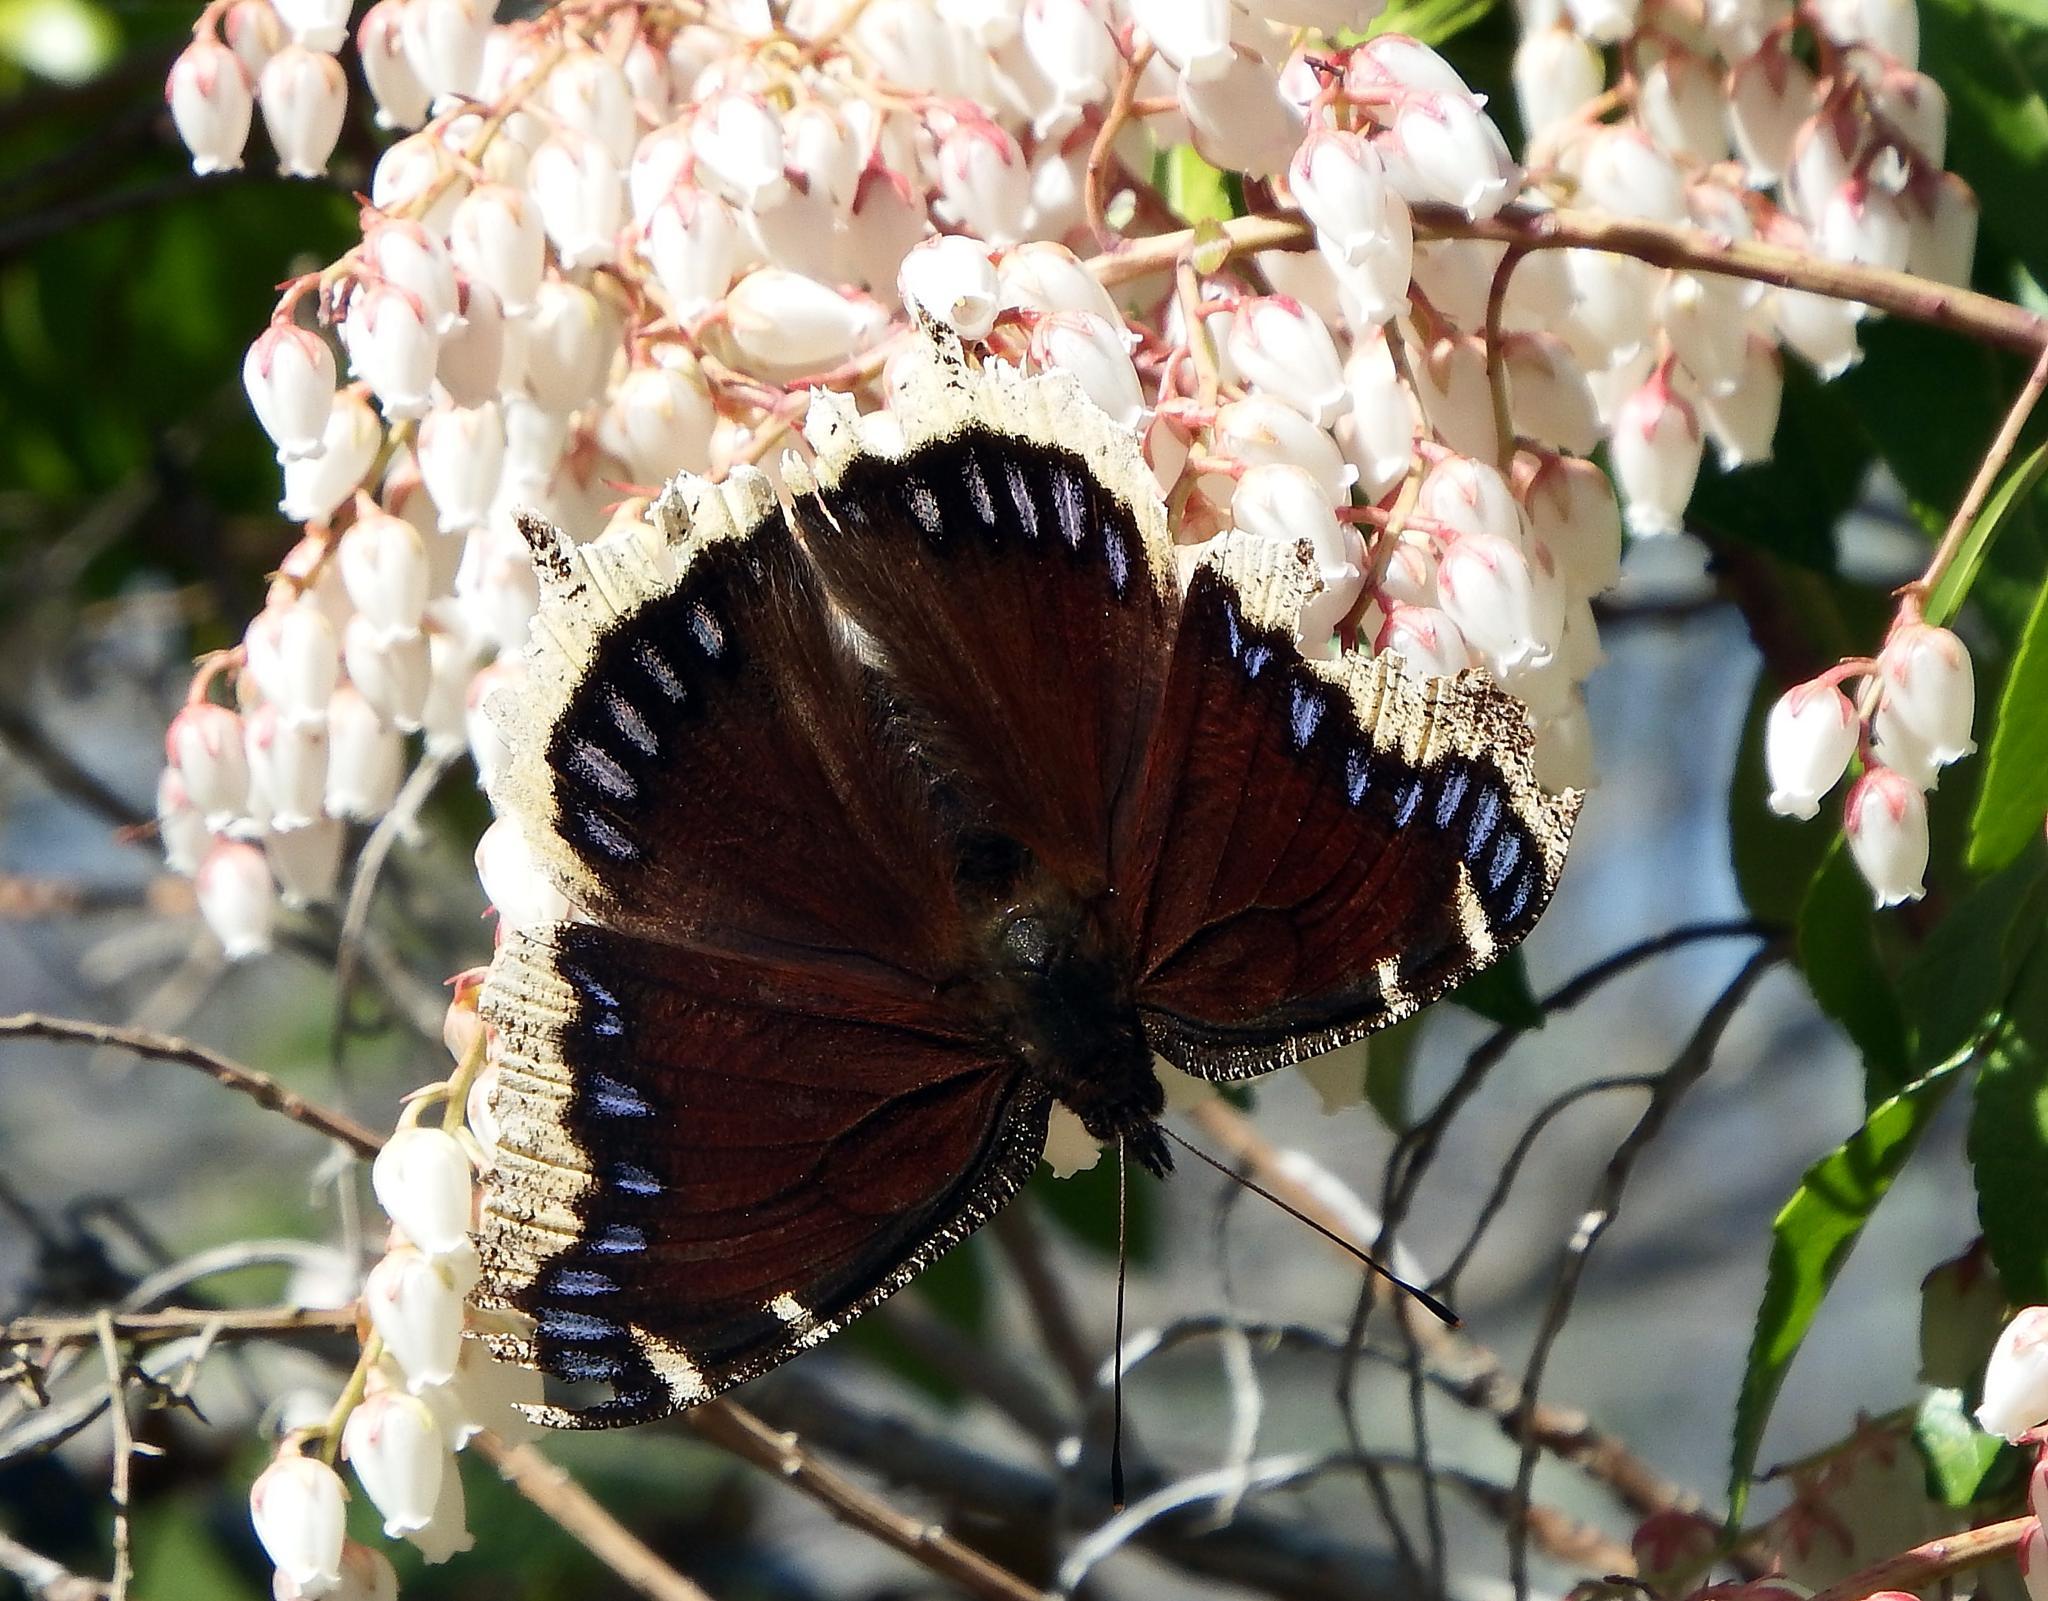 Pretty butterfly by Antonette Stiebritz